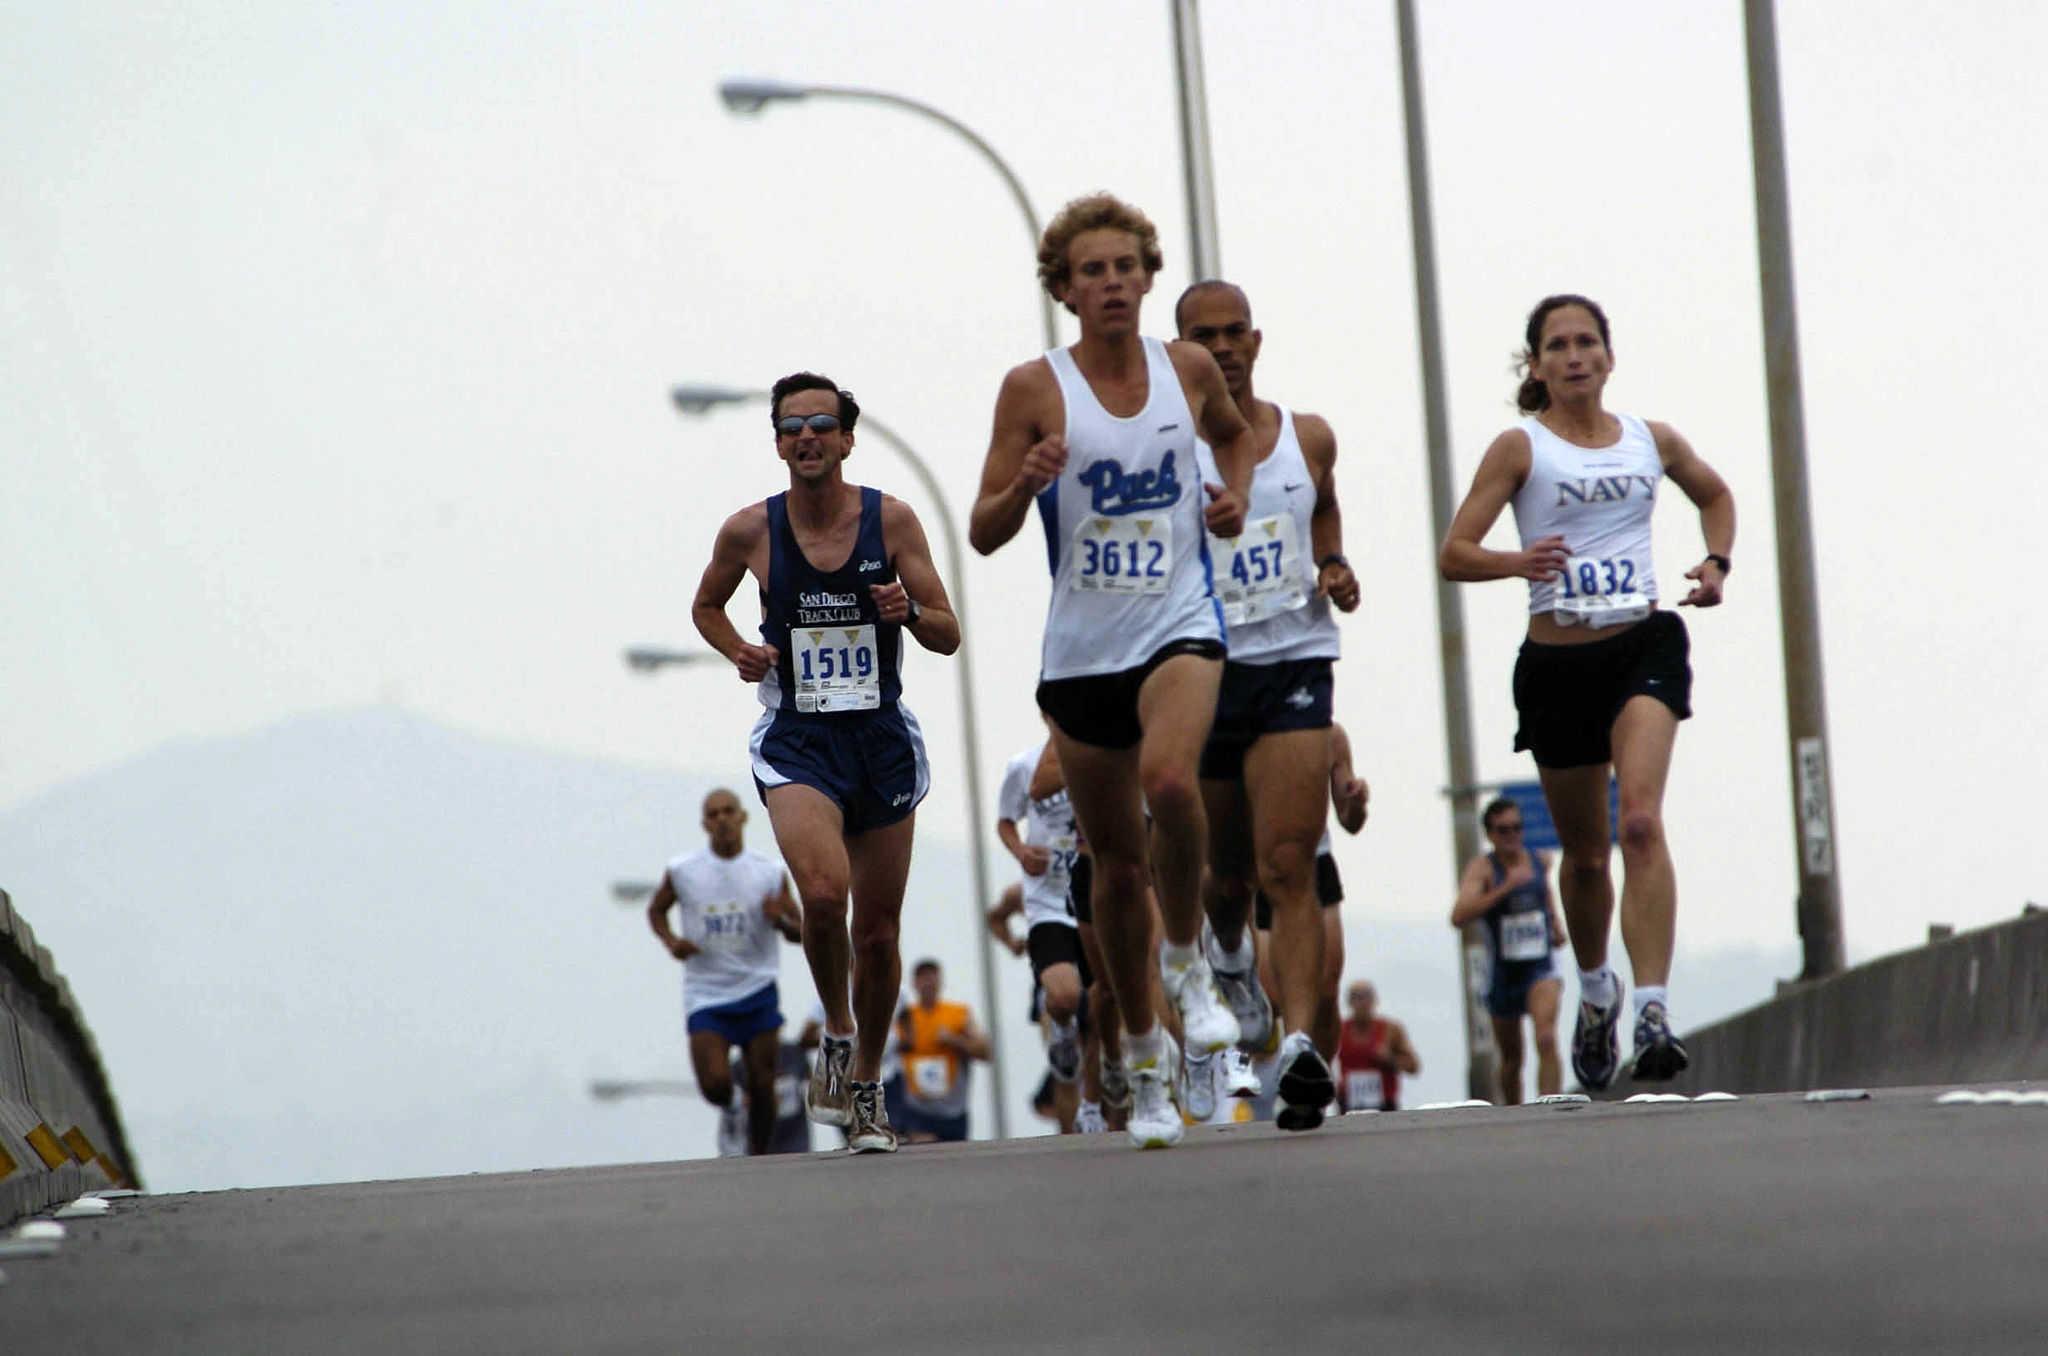 pics Tips for Your Walk Breaks While RunWalking